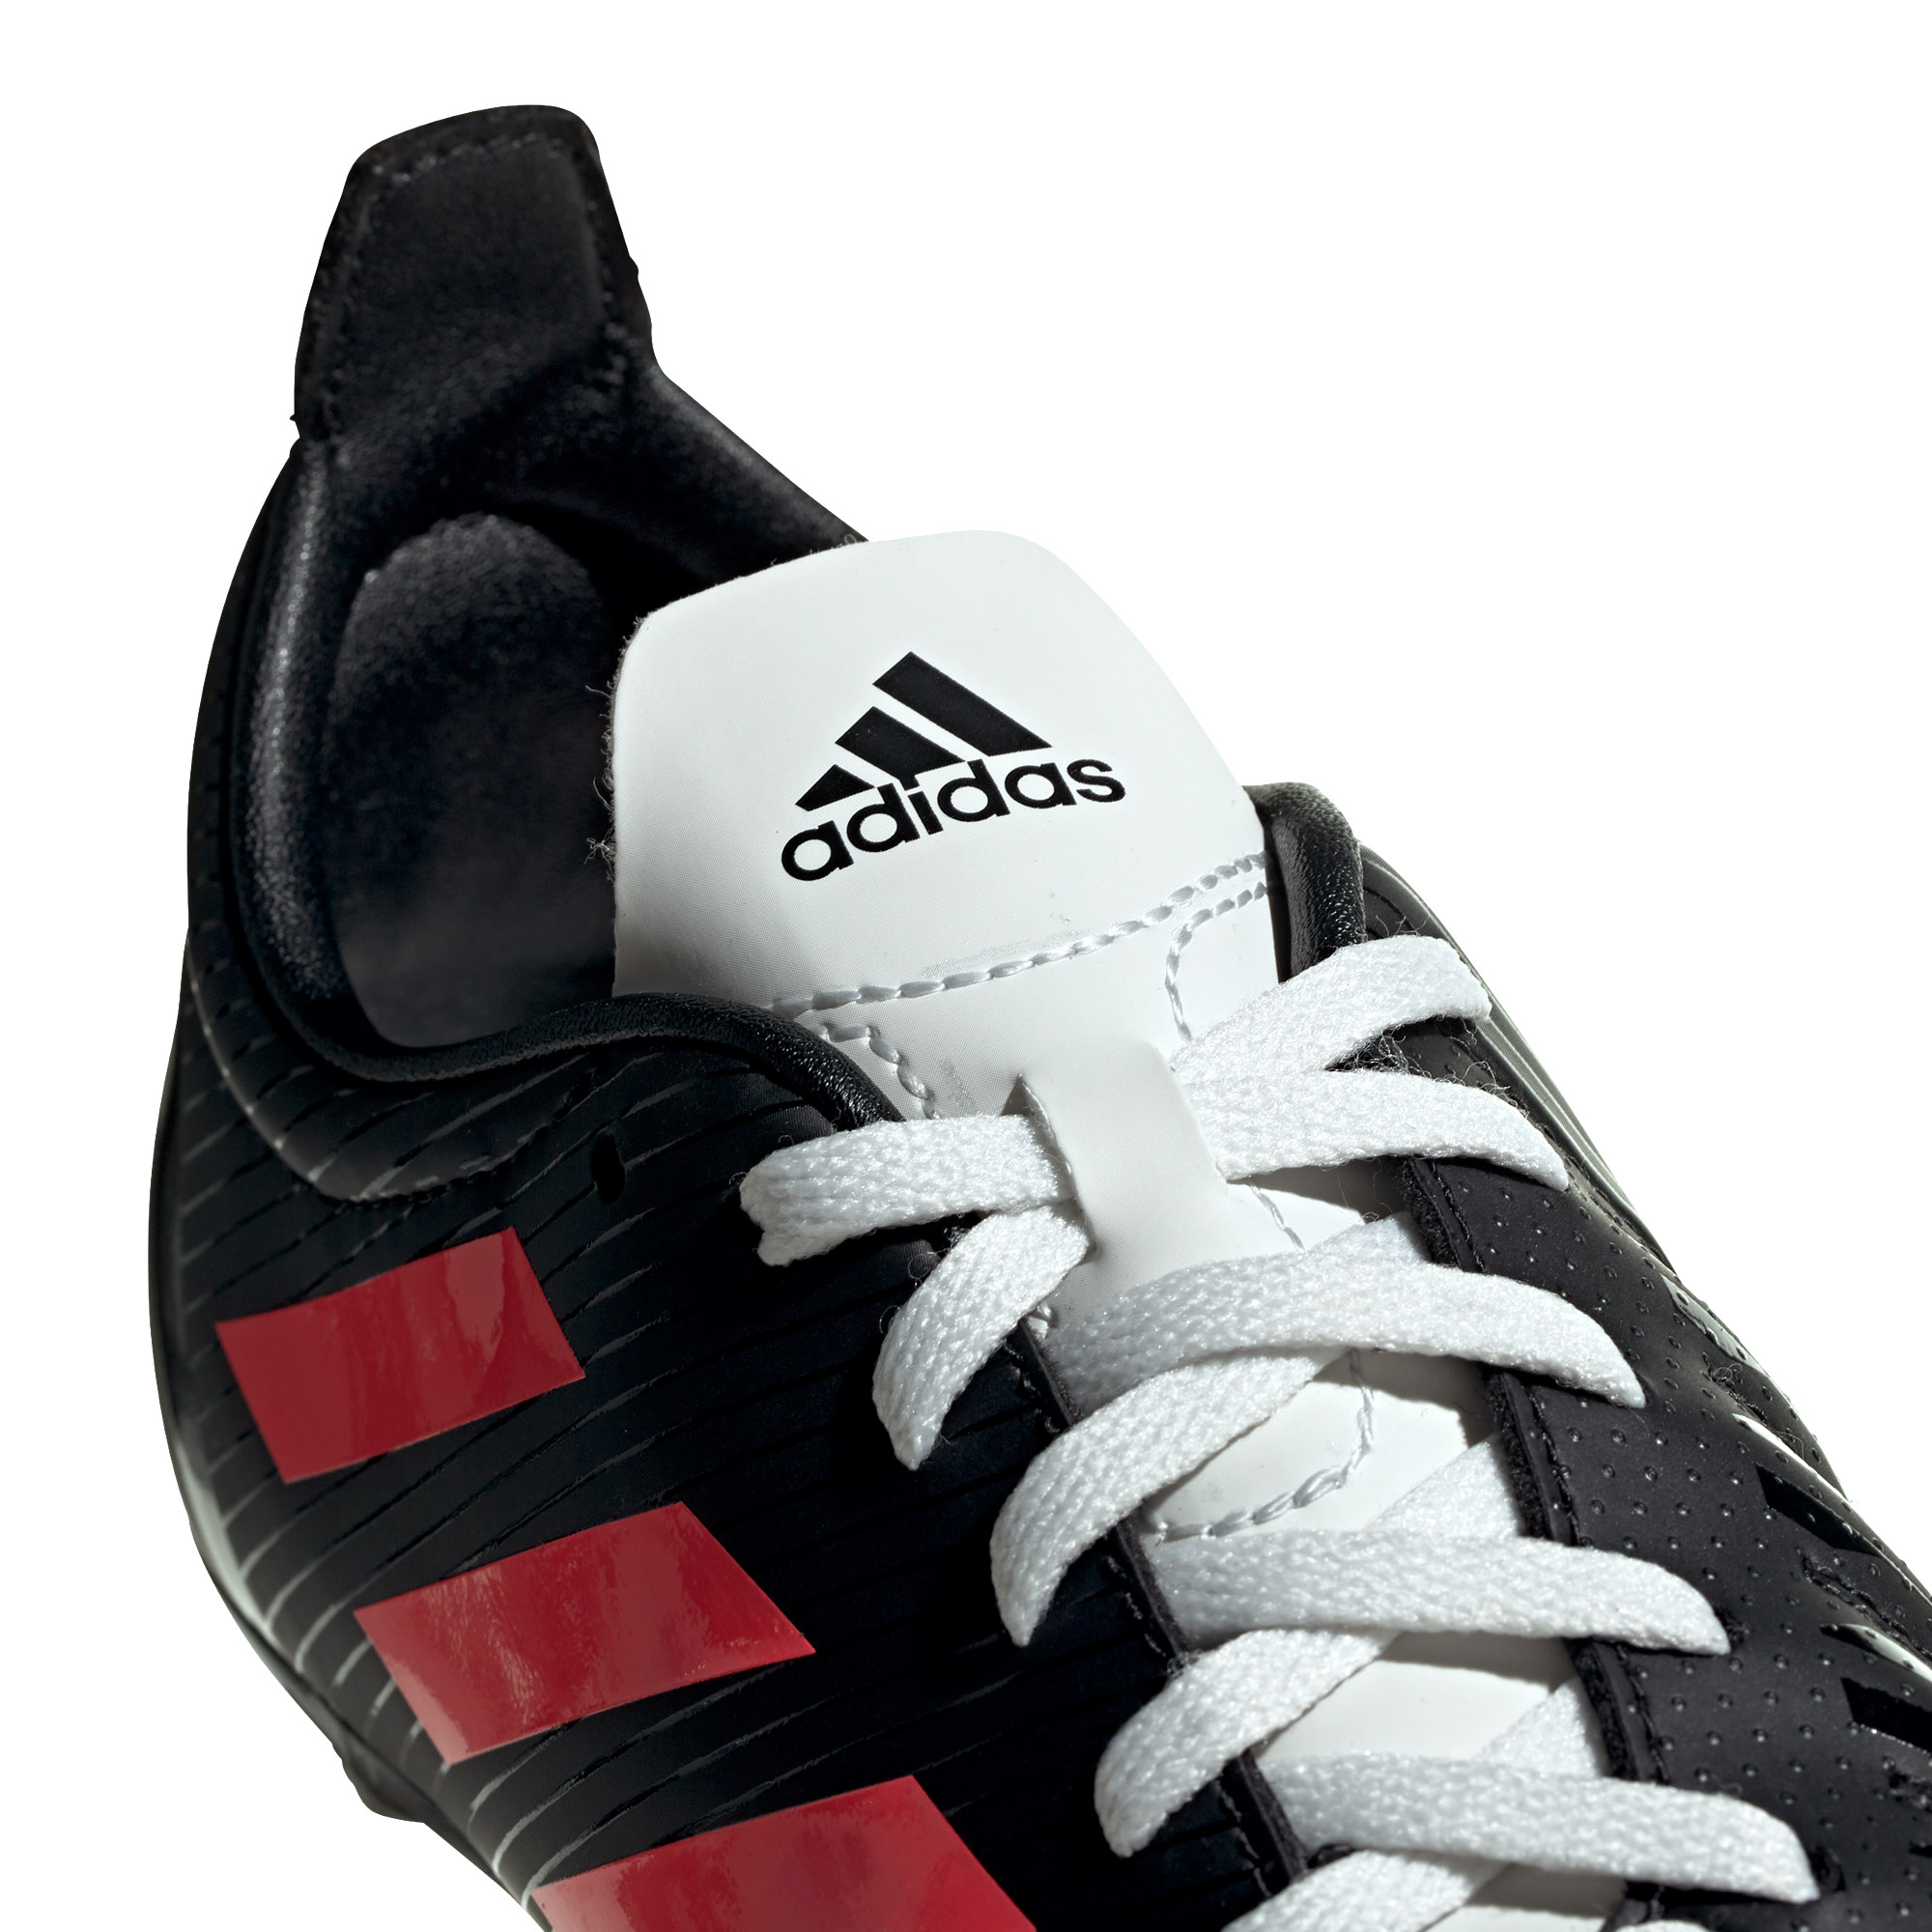 miniature 9 - Adidas Malice SG Terrain Souple Junior Enfants Rugby Boot Noir/Rose